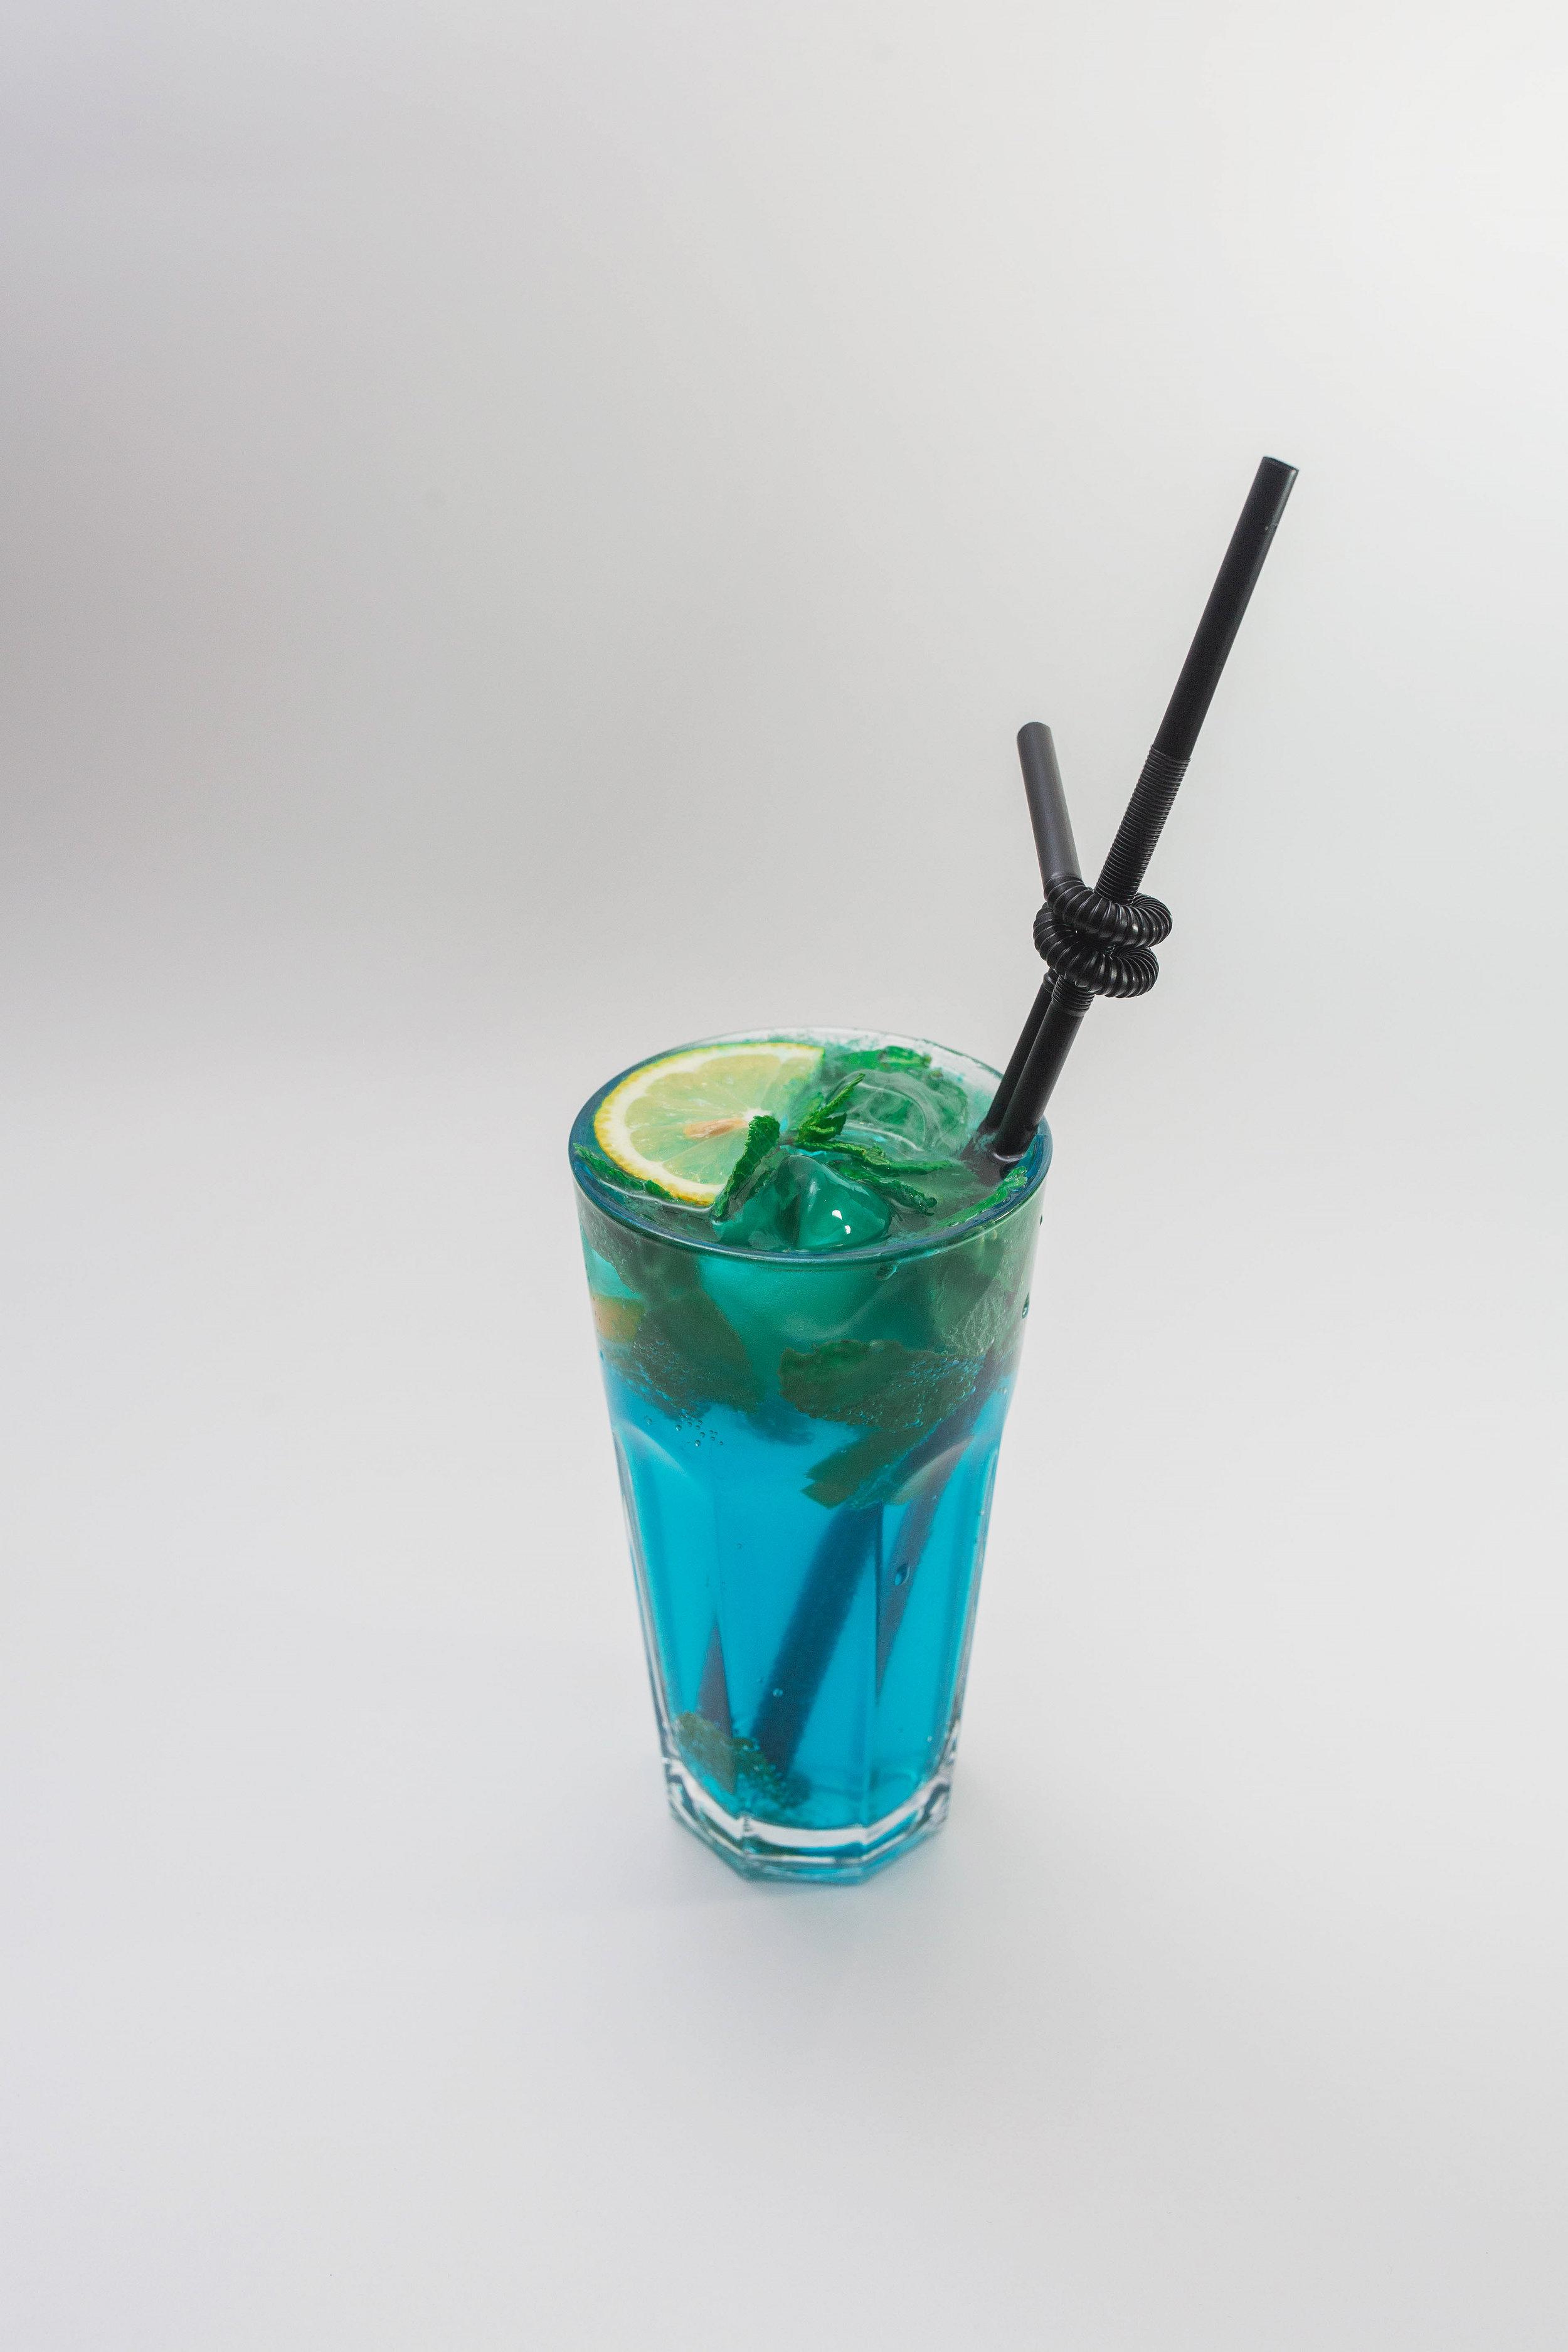 Lemonade - Classic / Blue / Cherry / Orange / Strawberry / Pineapple0.3 / 1.0160 kgs / 330 kgs